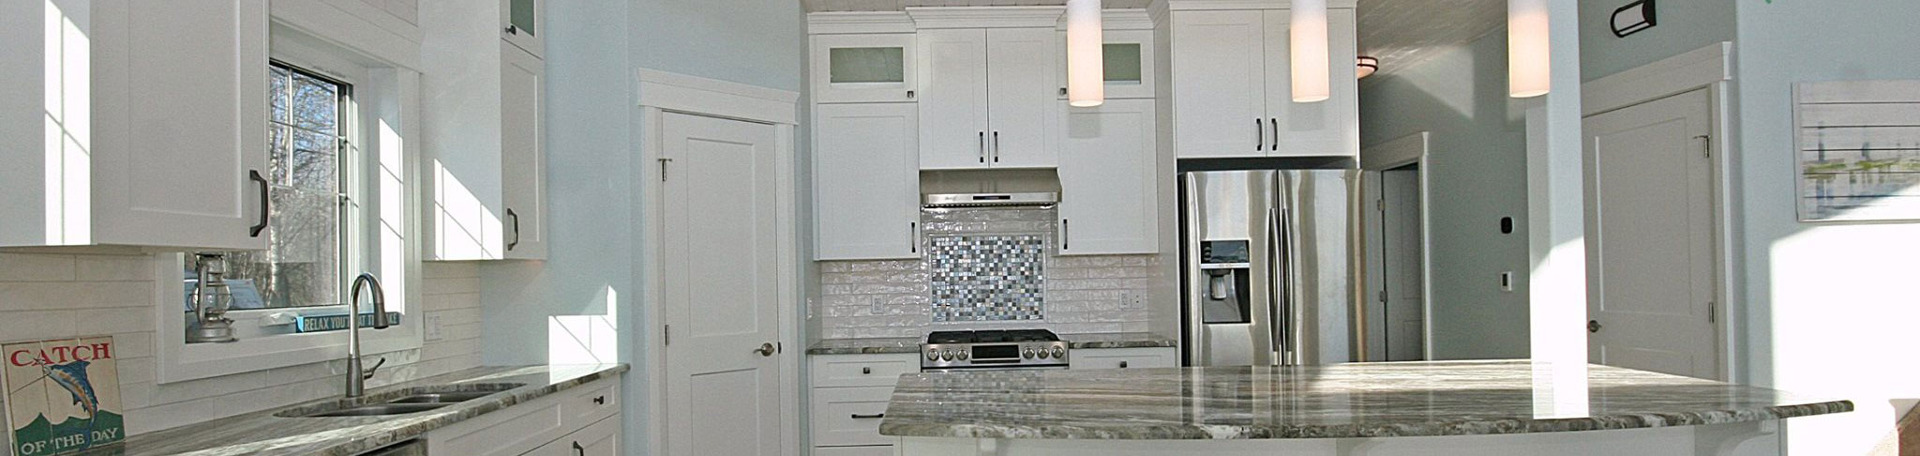 kitchen cabinets and bathroom vanities gem cabinets edmonton st